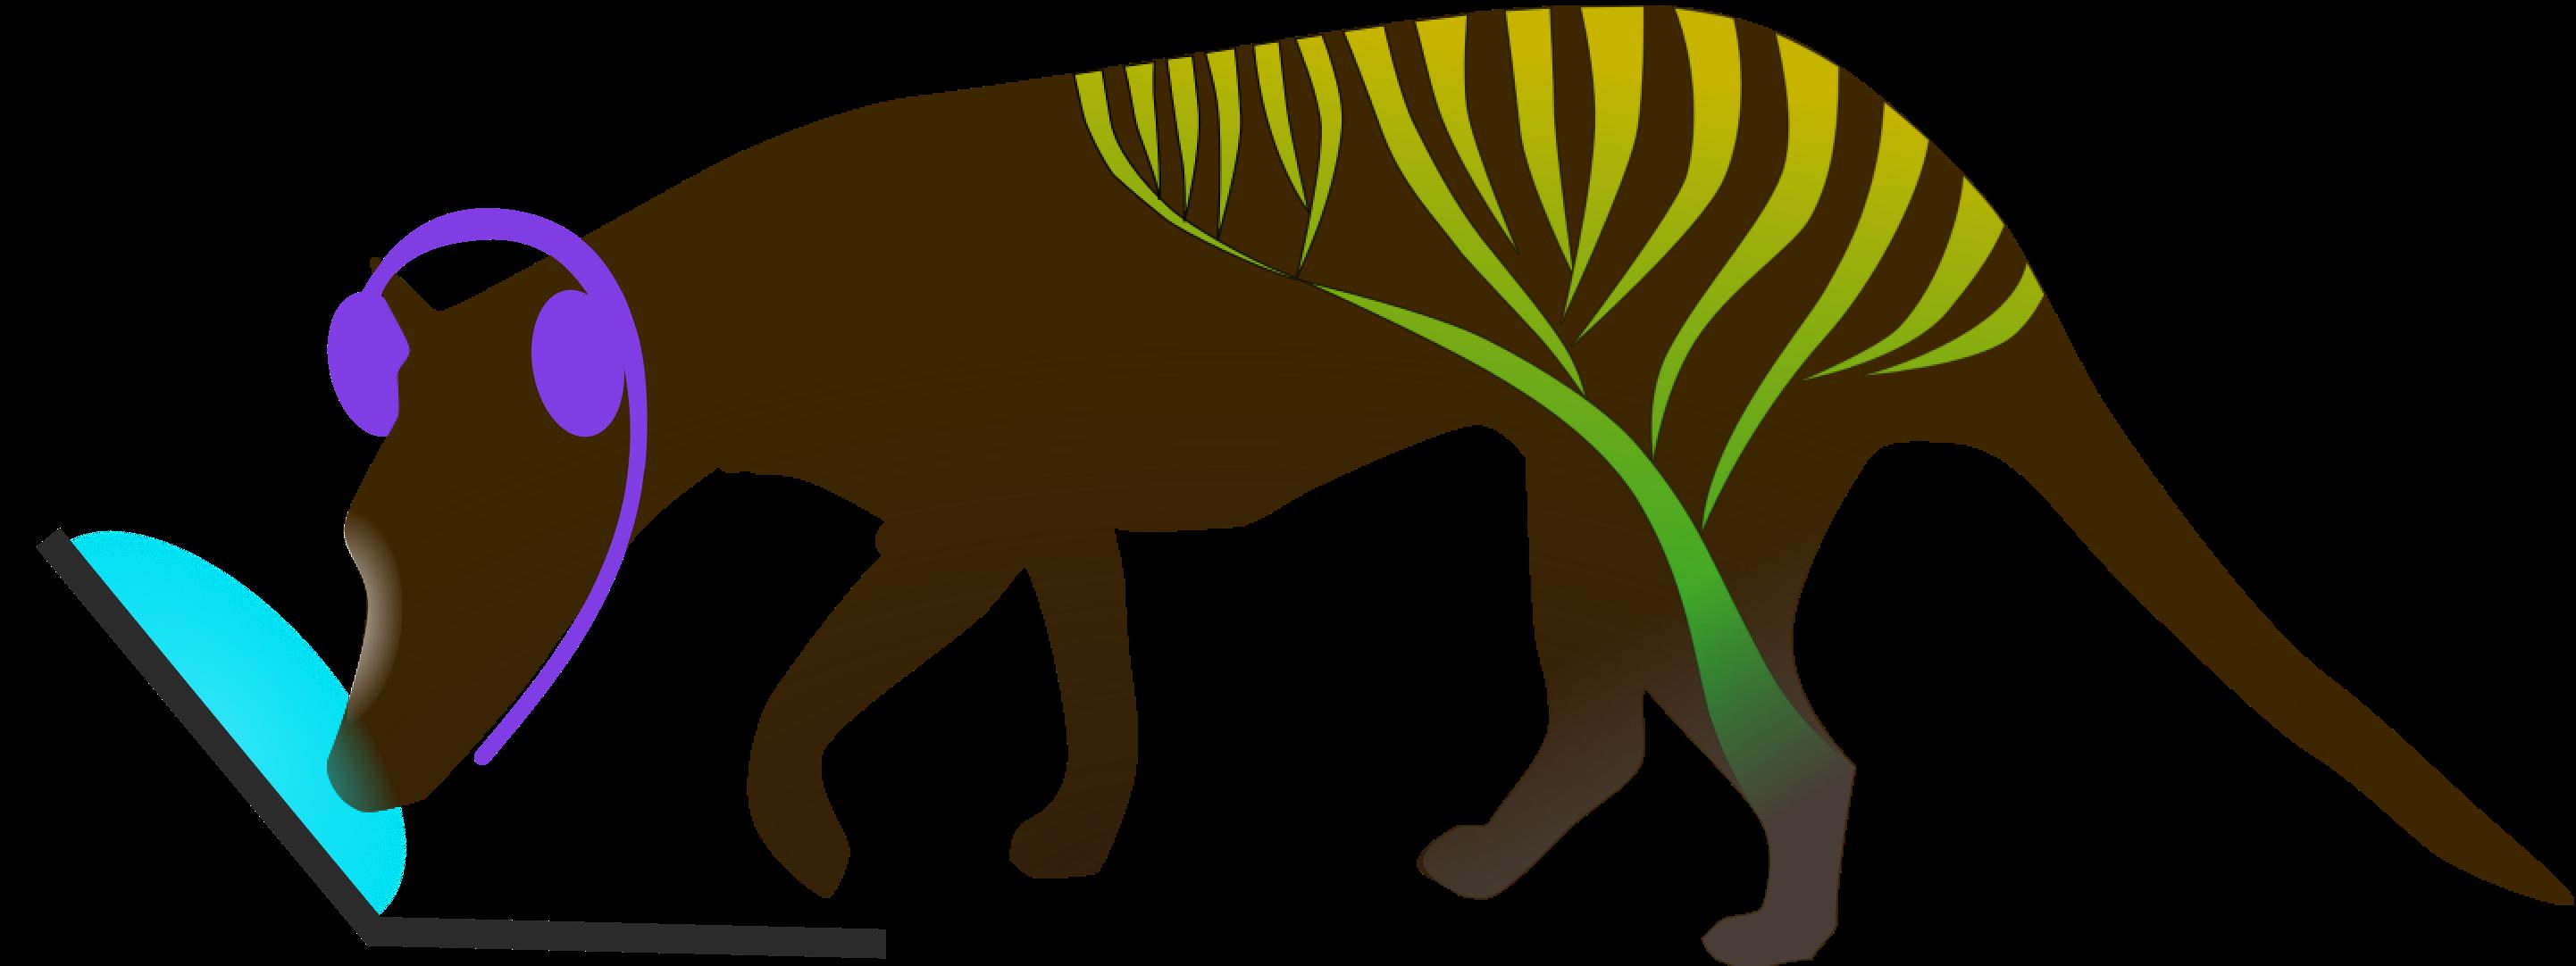 Phylomania logo